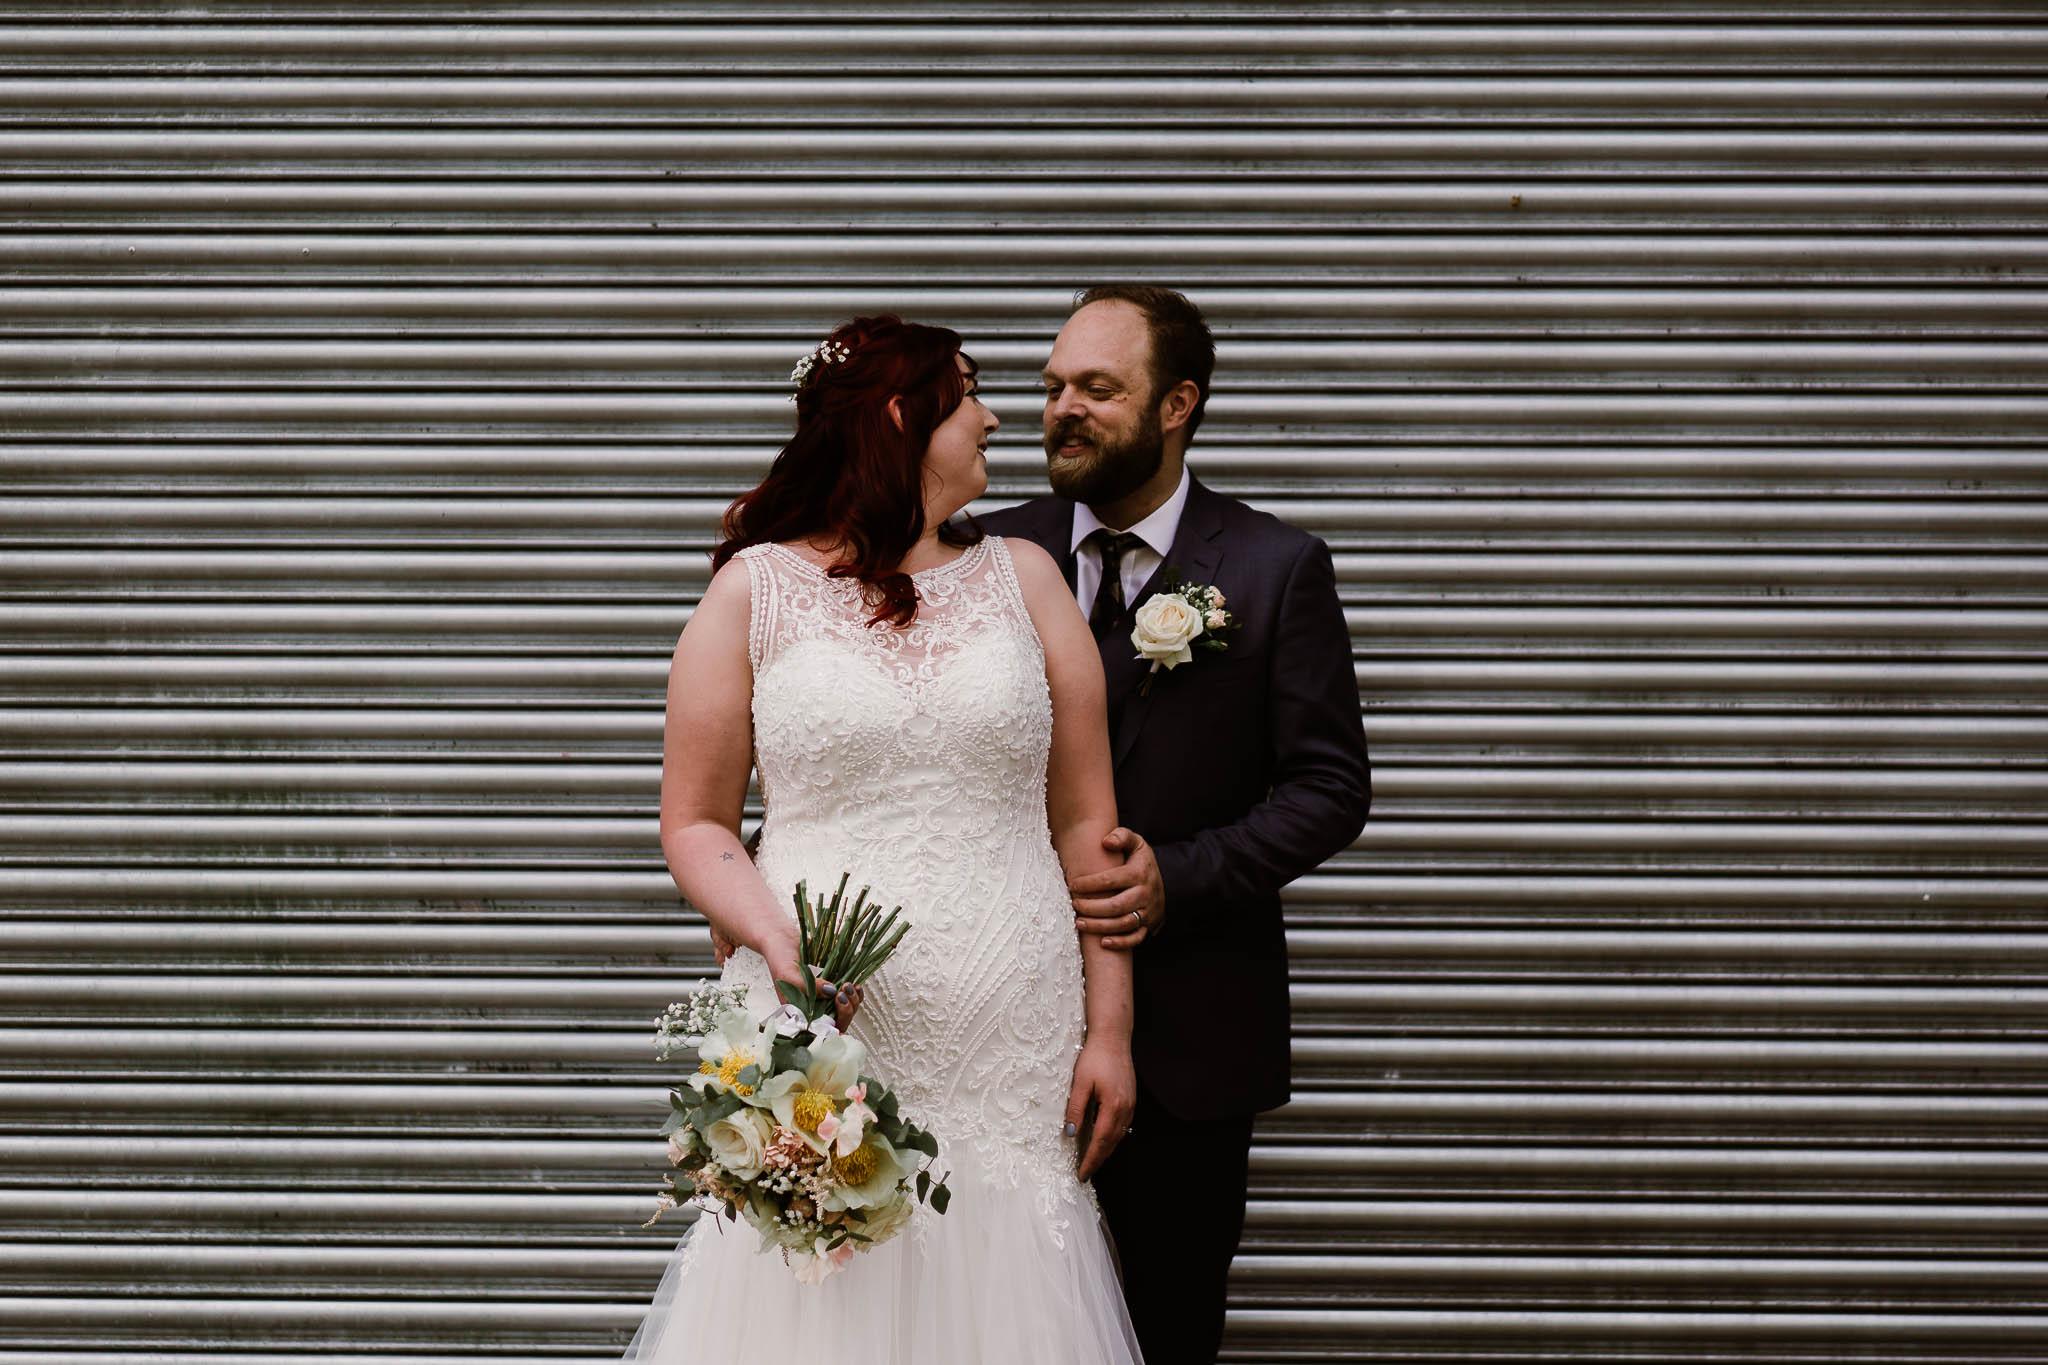 Wedding-Photographer-Sussex-Brighton-30.jpg